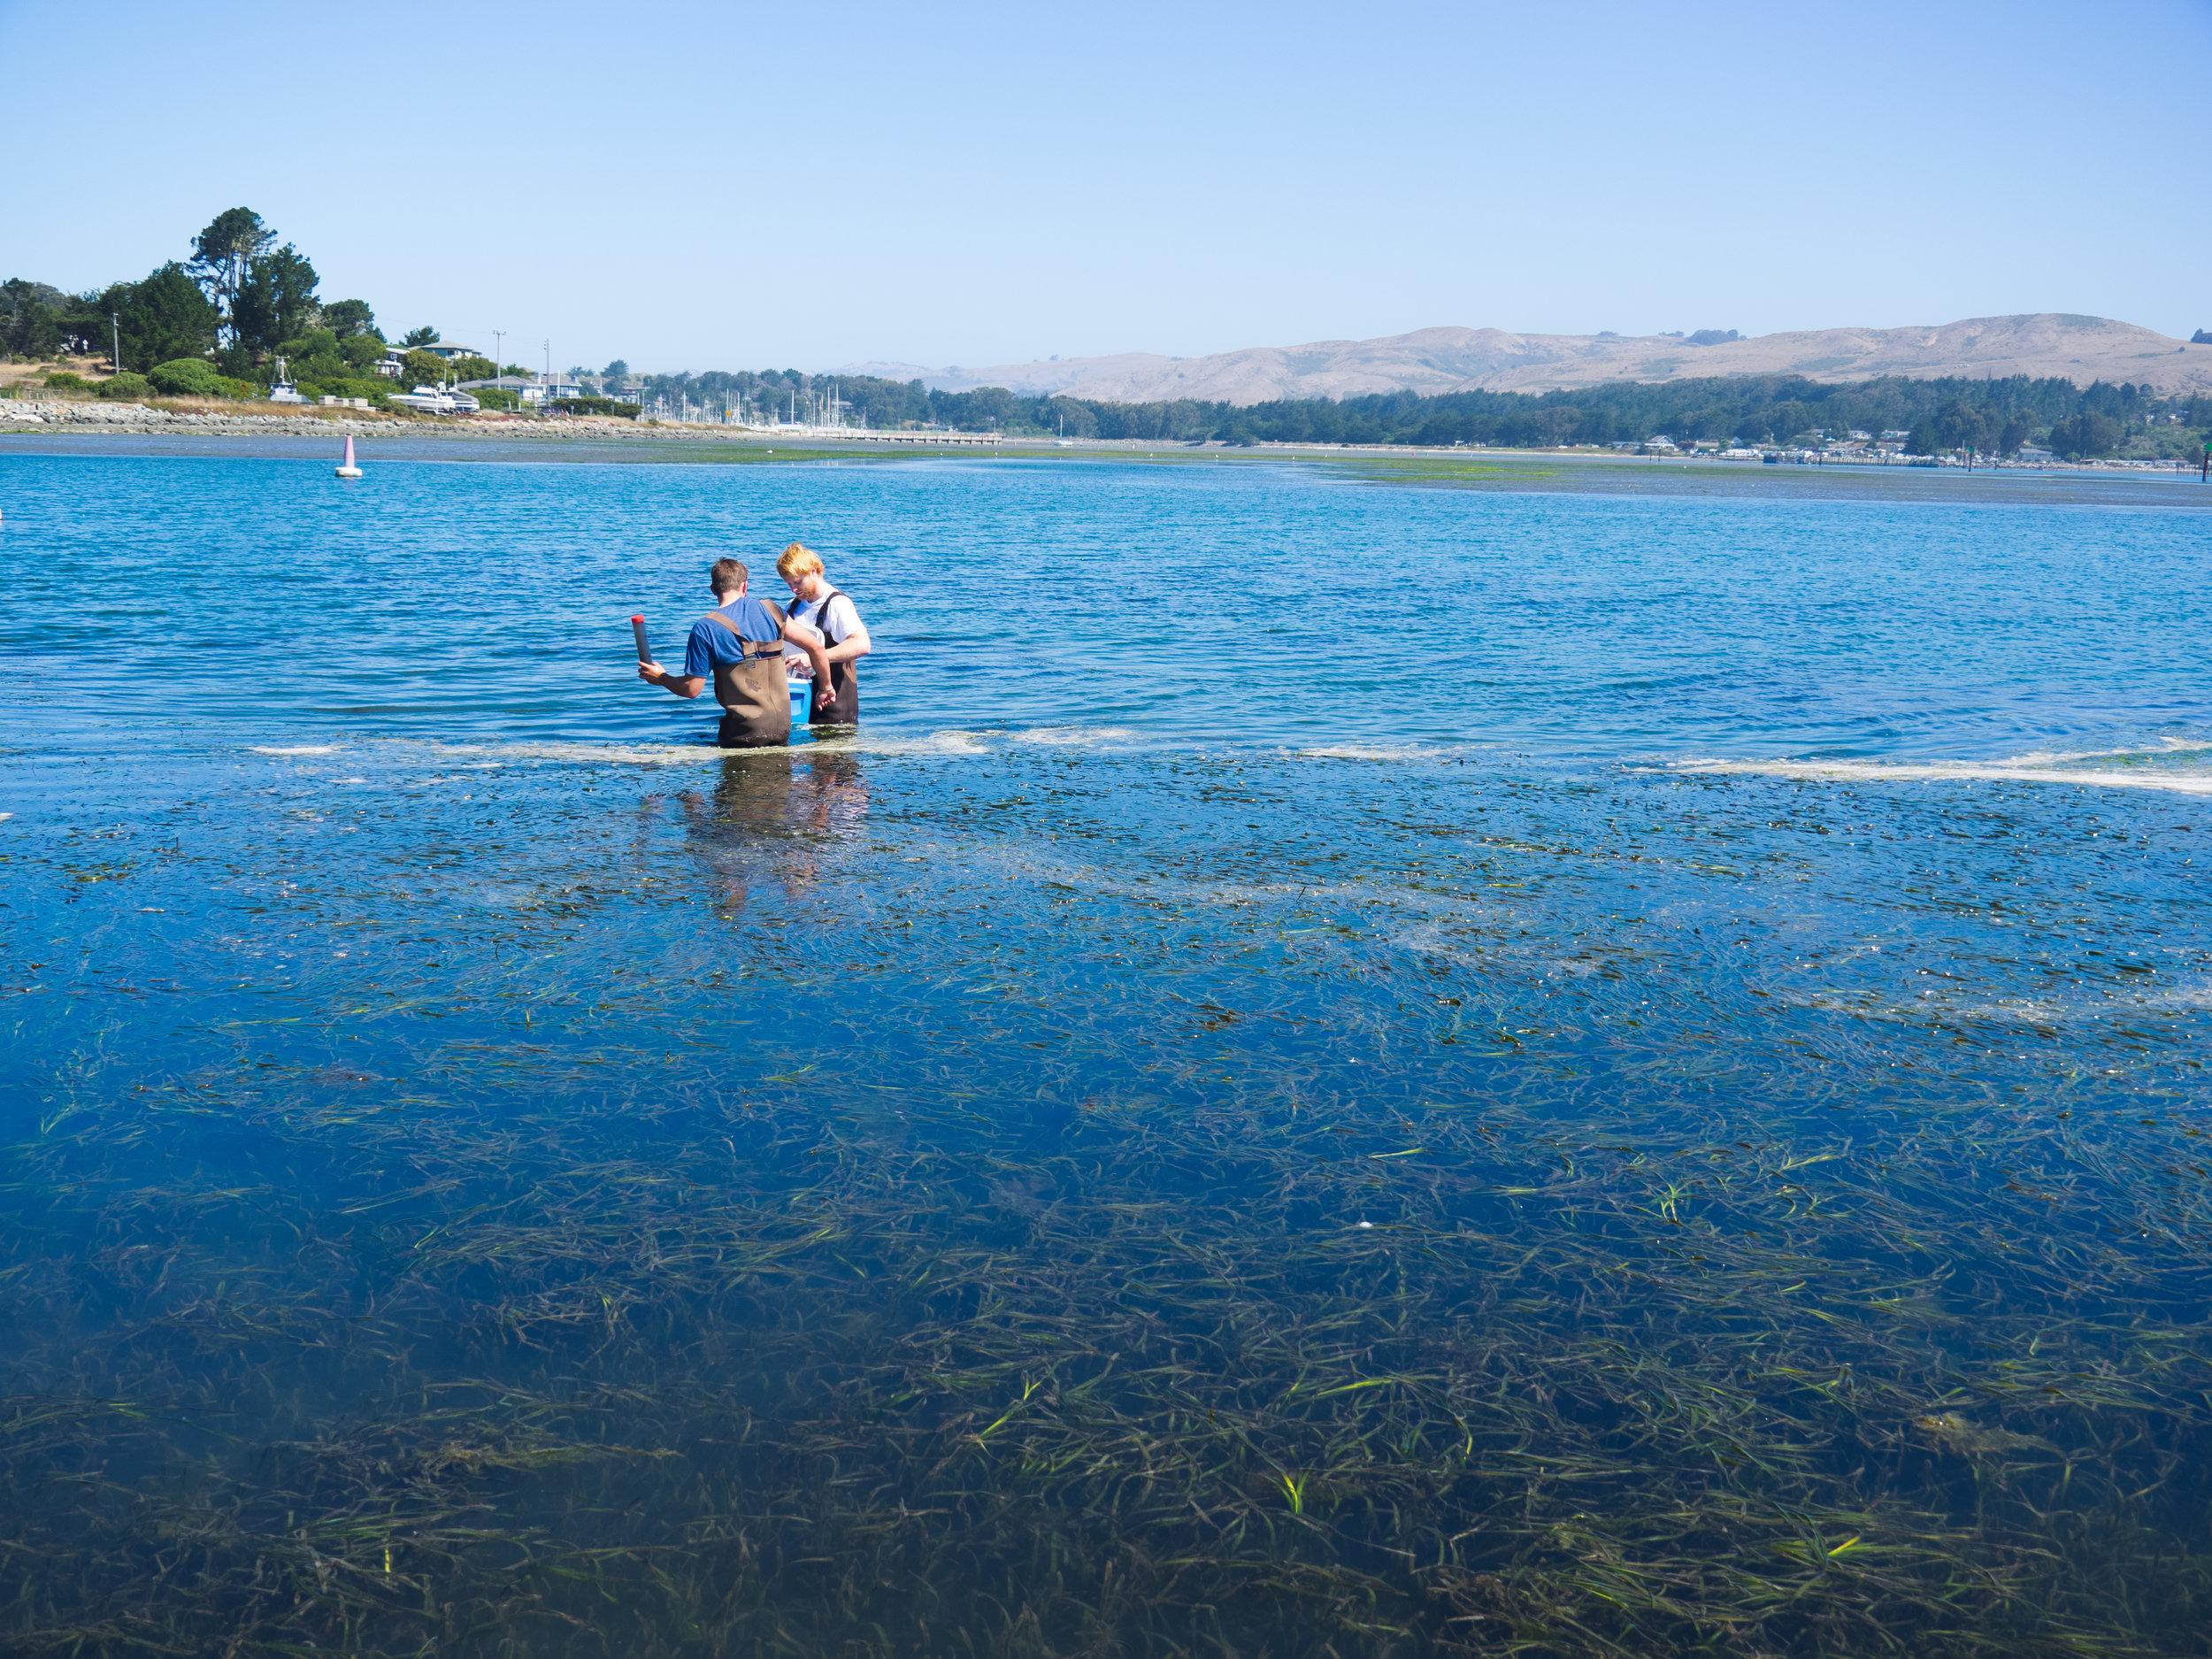 Sampling seagrass sediments with B. O'Donnell in Bodega Harbor, CA. Photo credit: A. Ninokawa